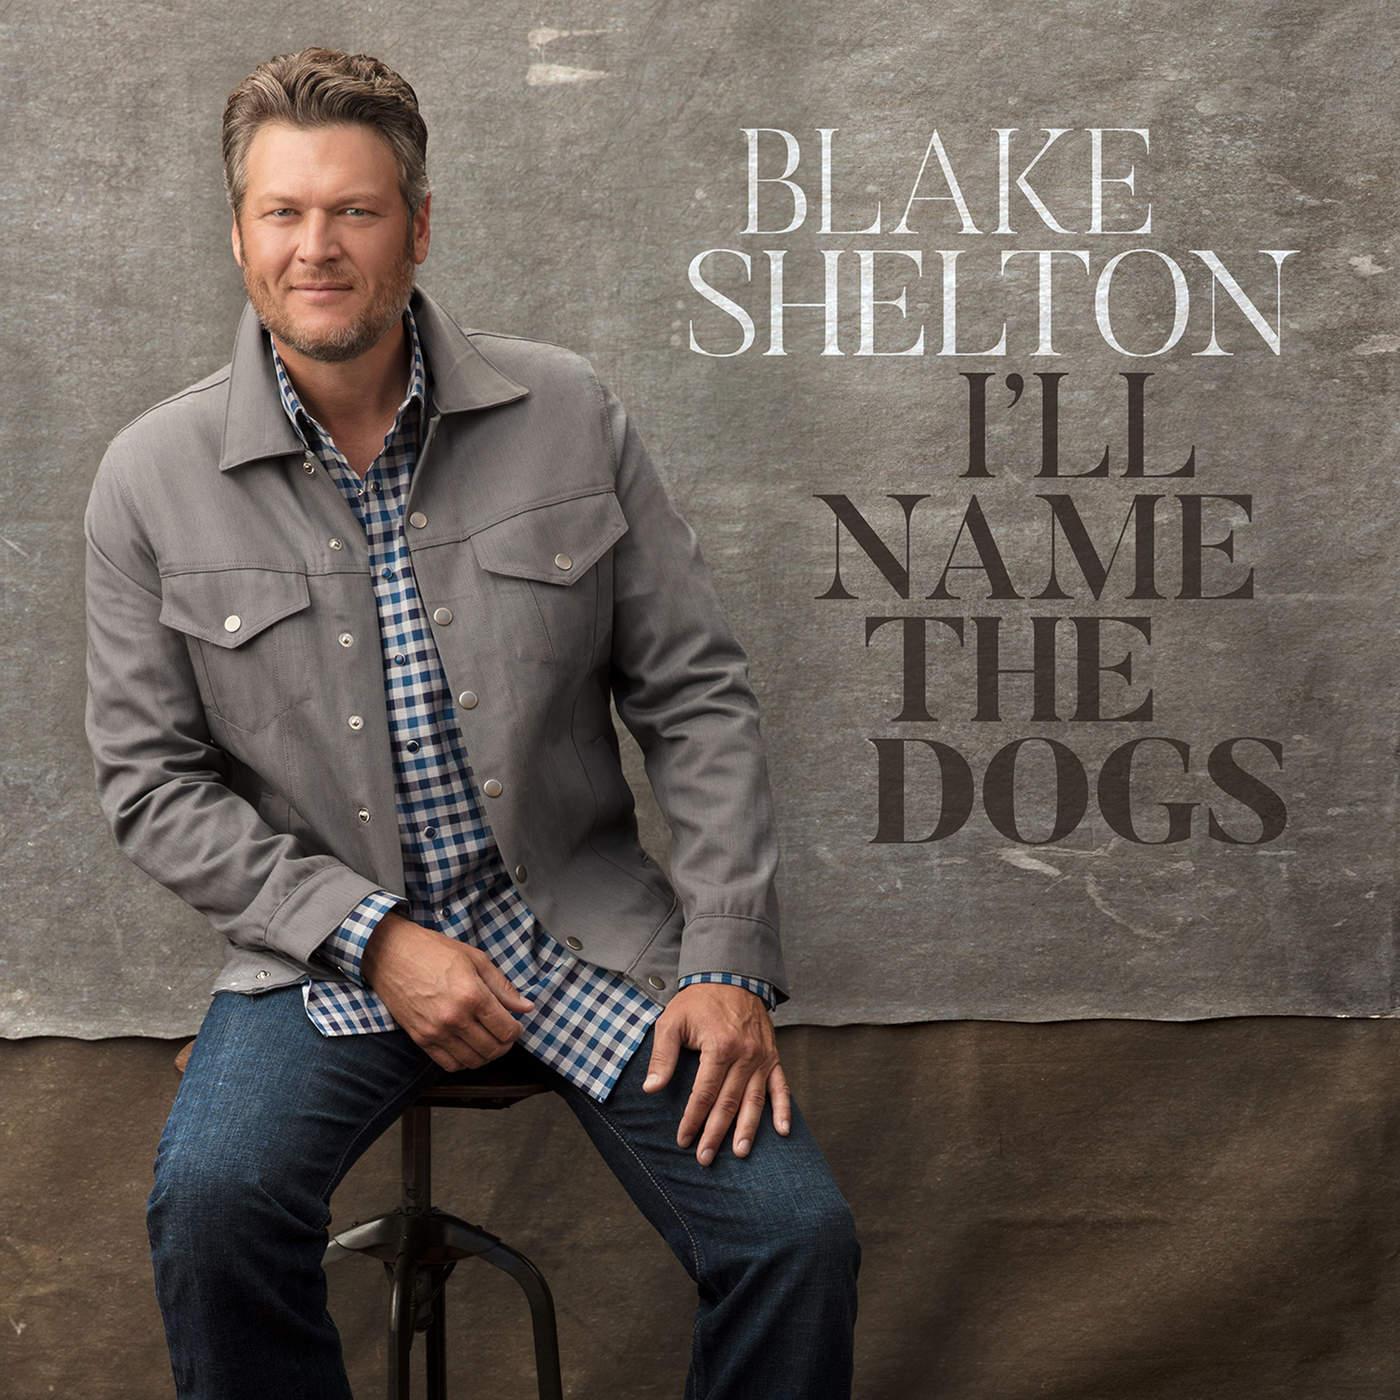 Blake Shelton - I'll Name the Dogs - Single